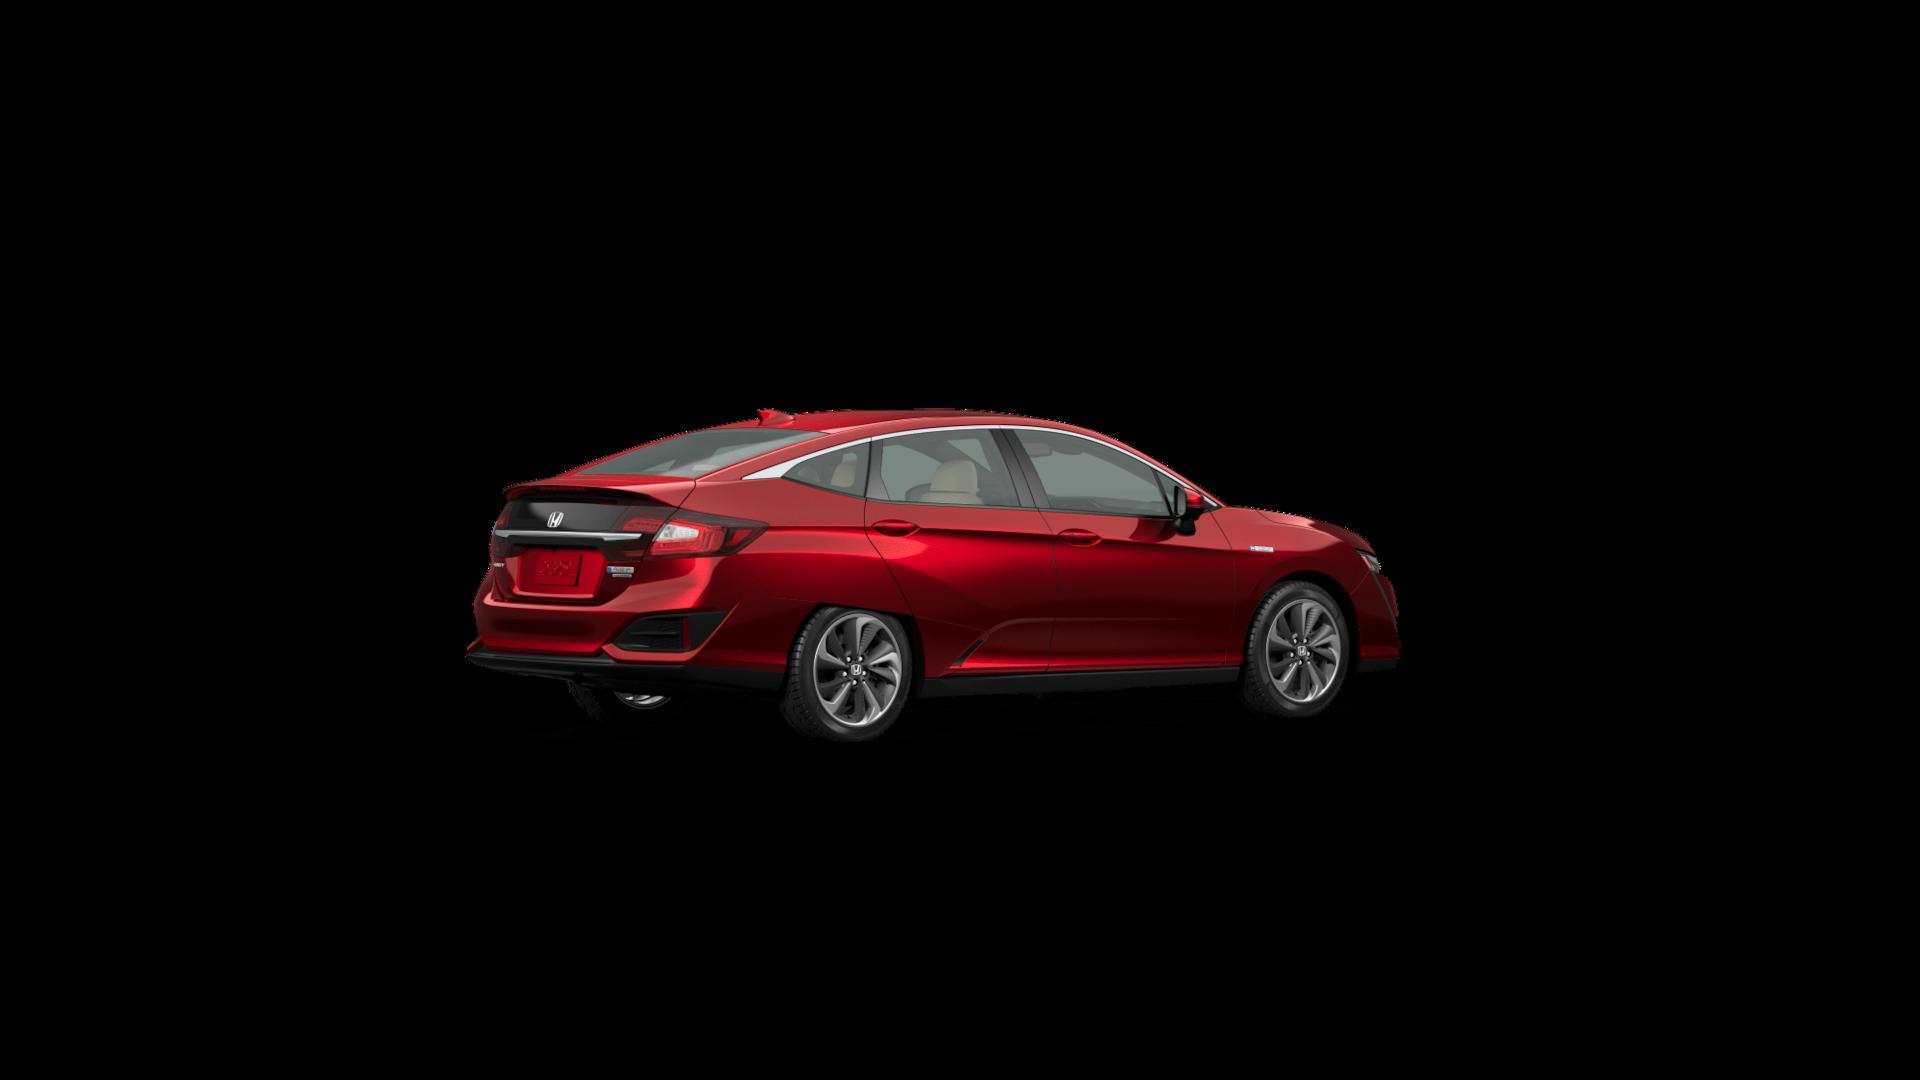 2021 Honda Clarity Plug In Hybrid The Versatile Hybrid Honda